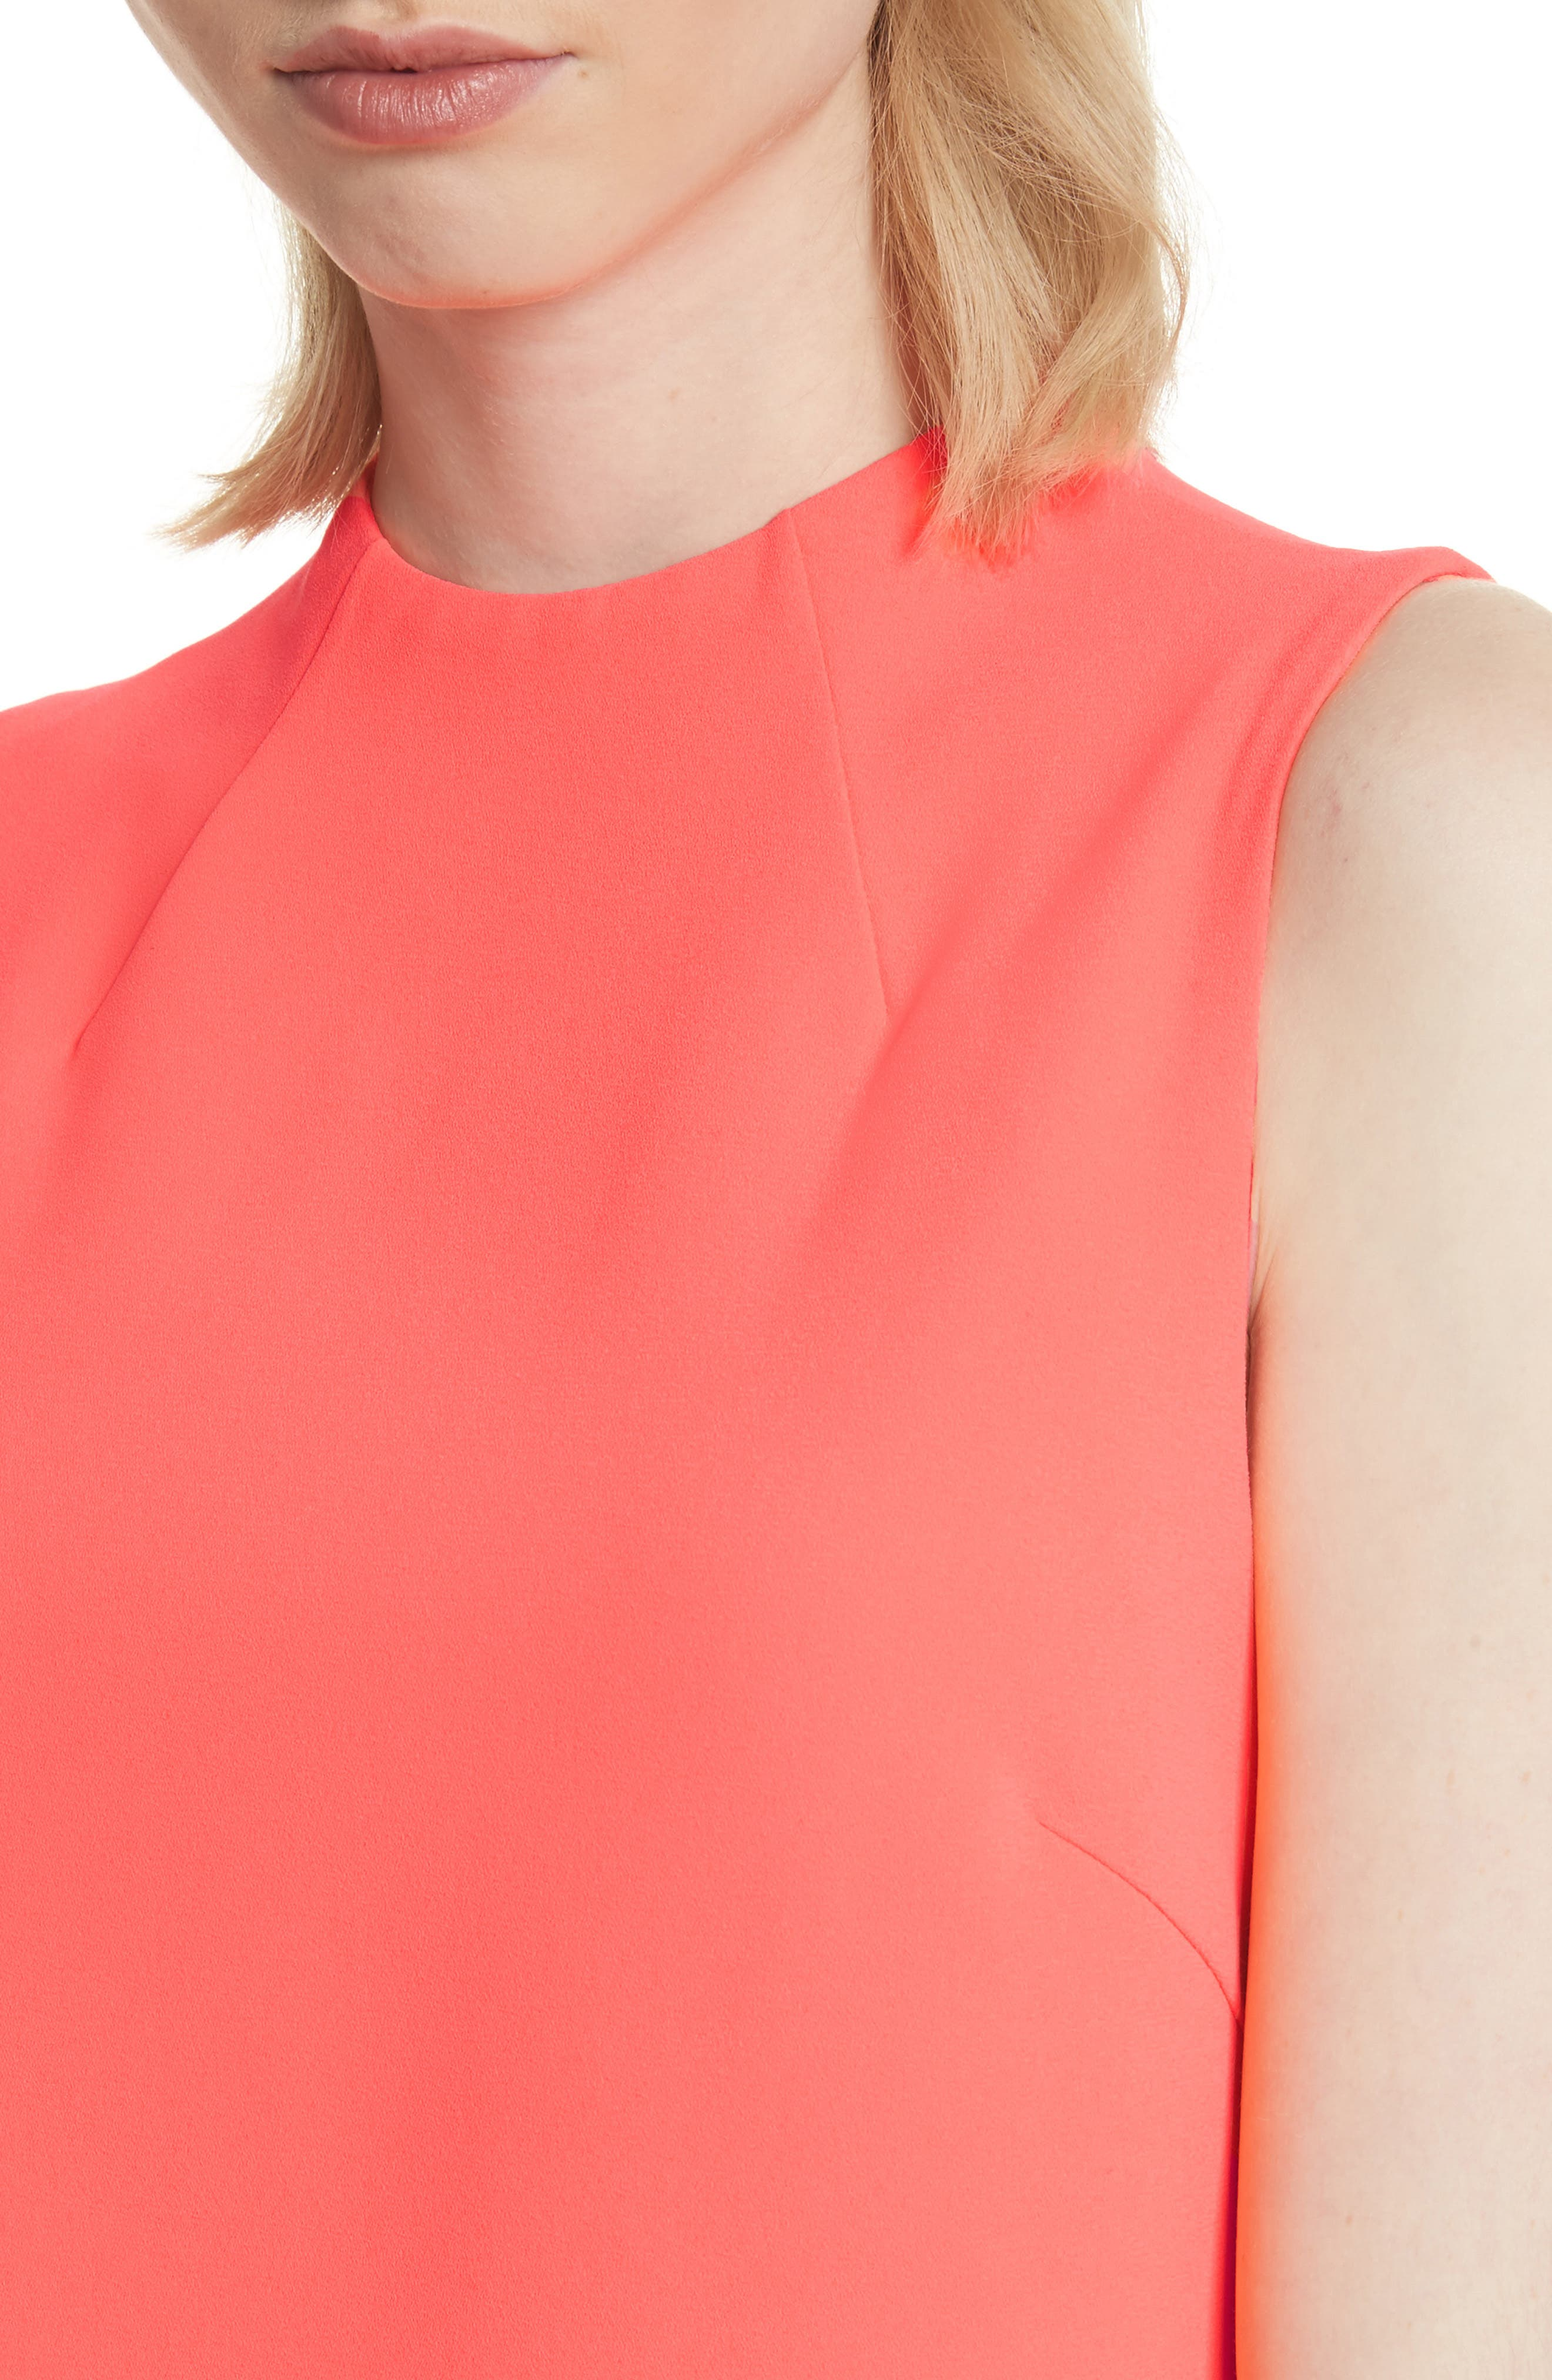 Coley A-Line Shift Dress,                             Alternate thumbnail 4, color,                             800